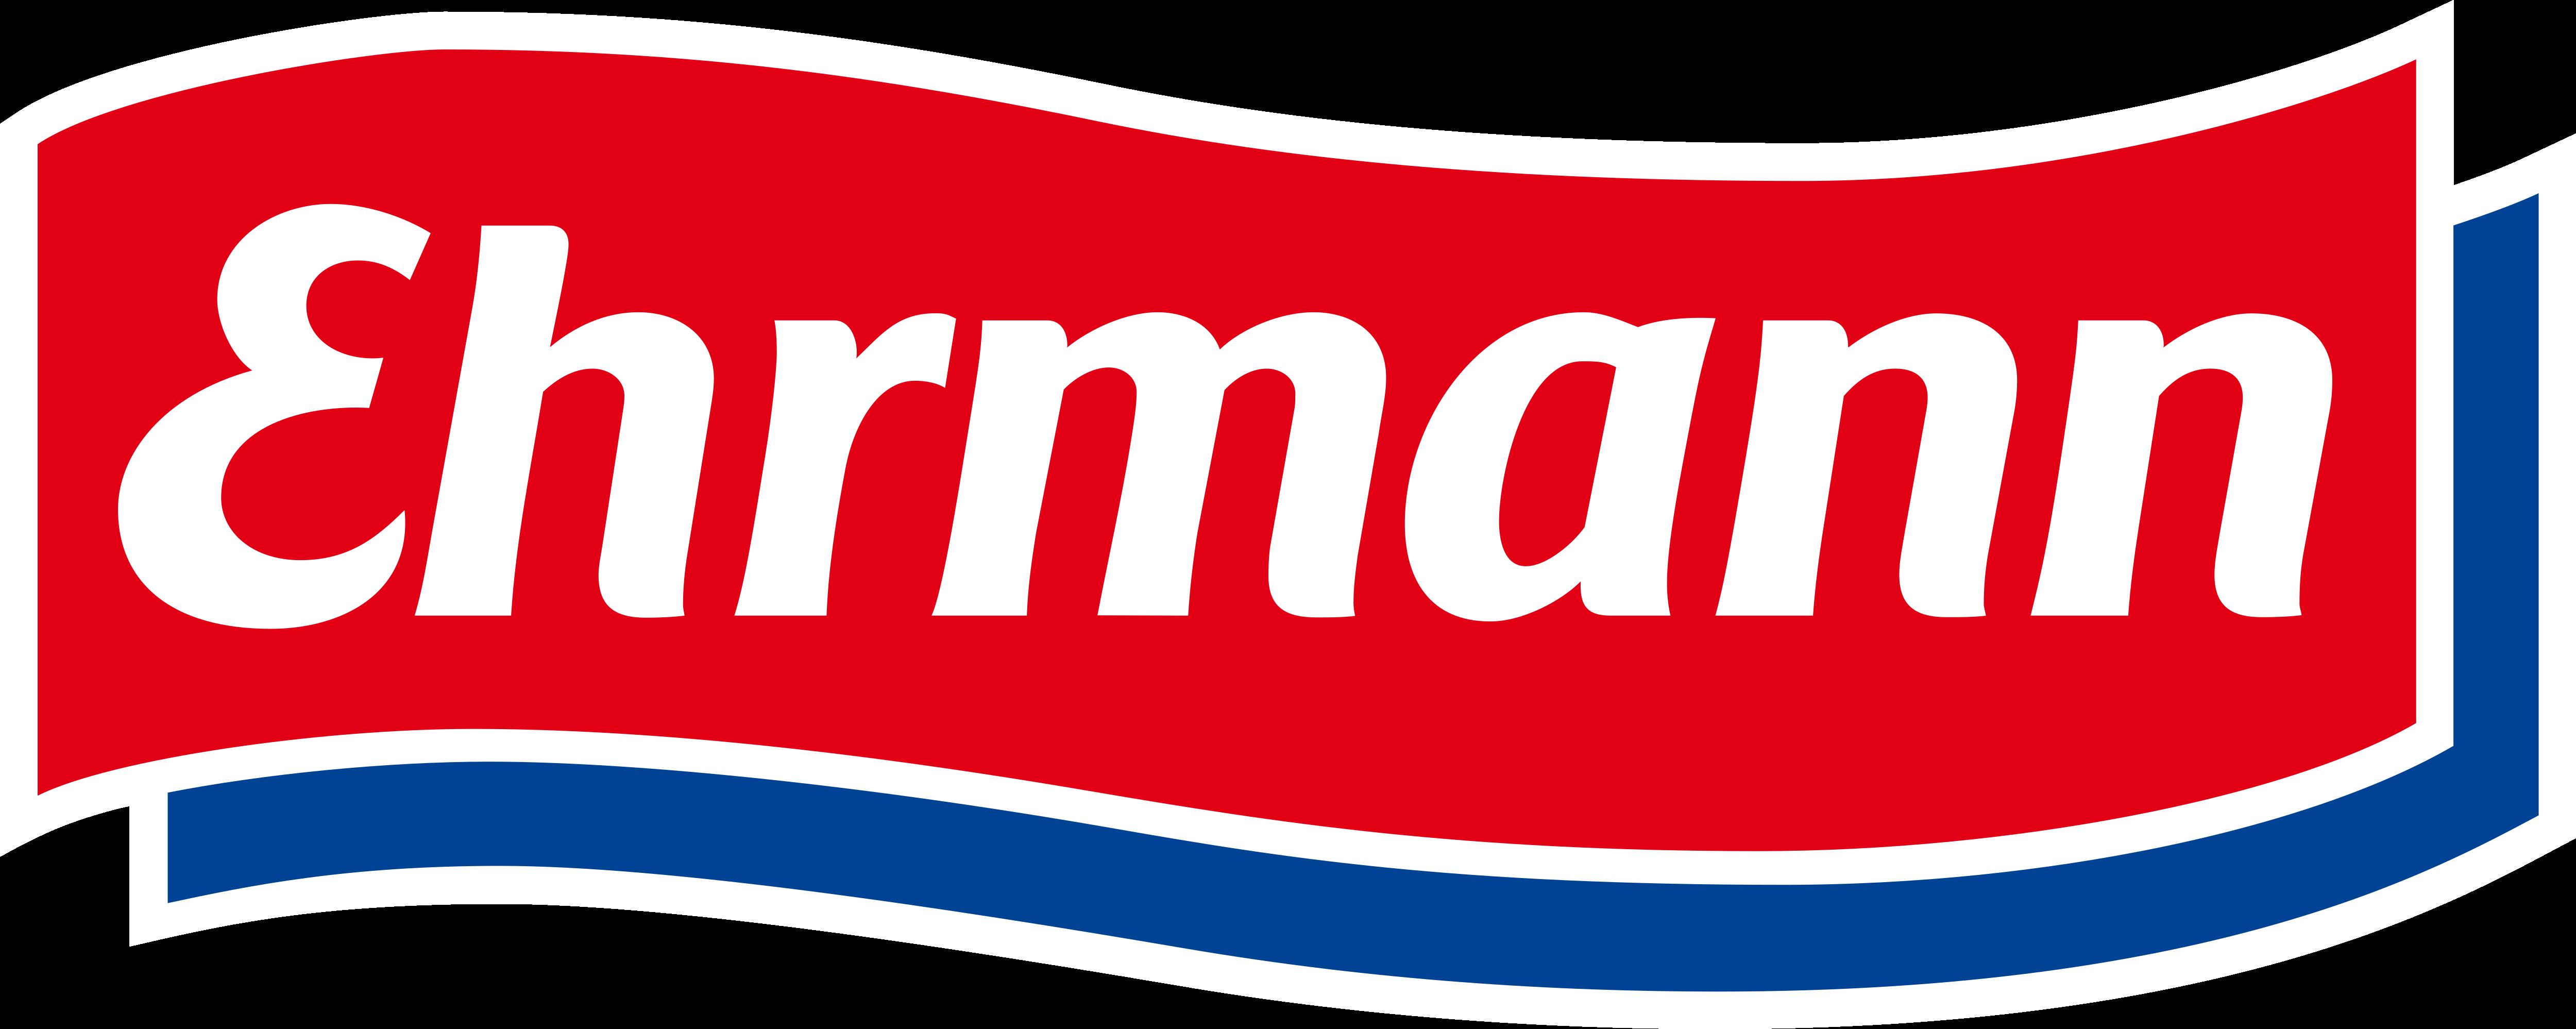 ehrmann